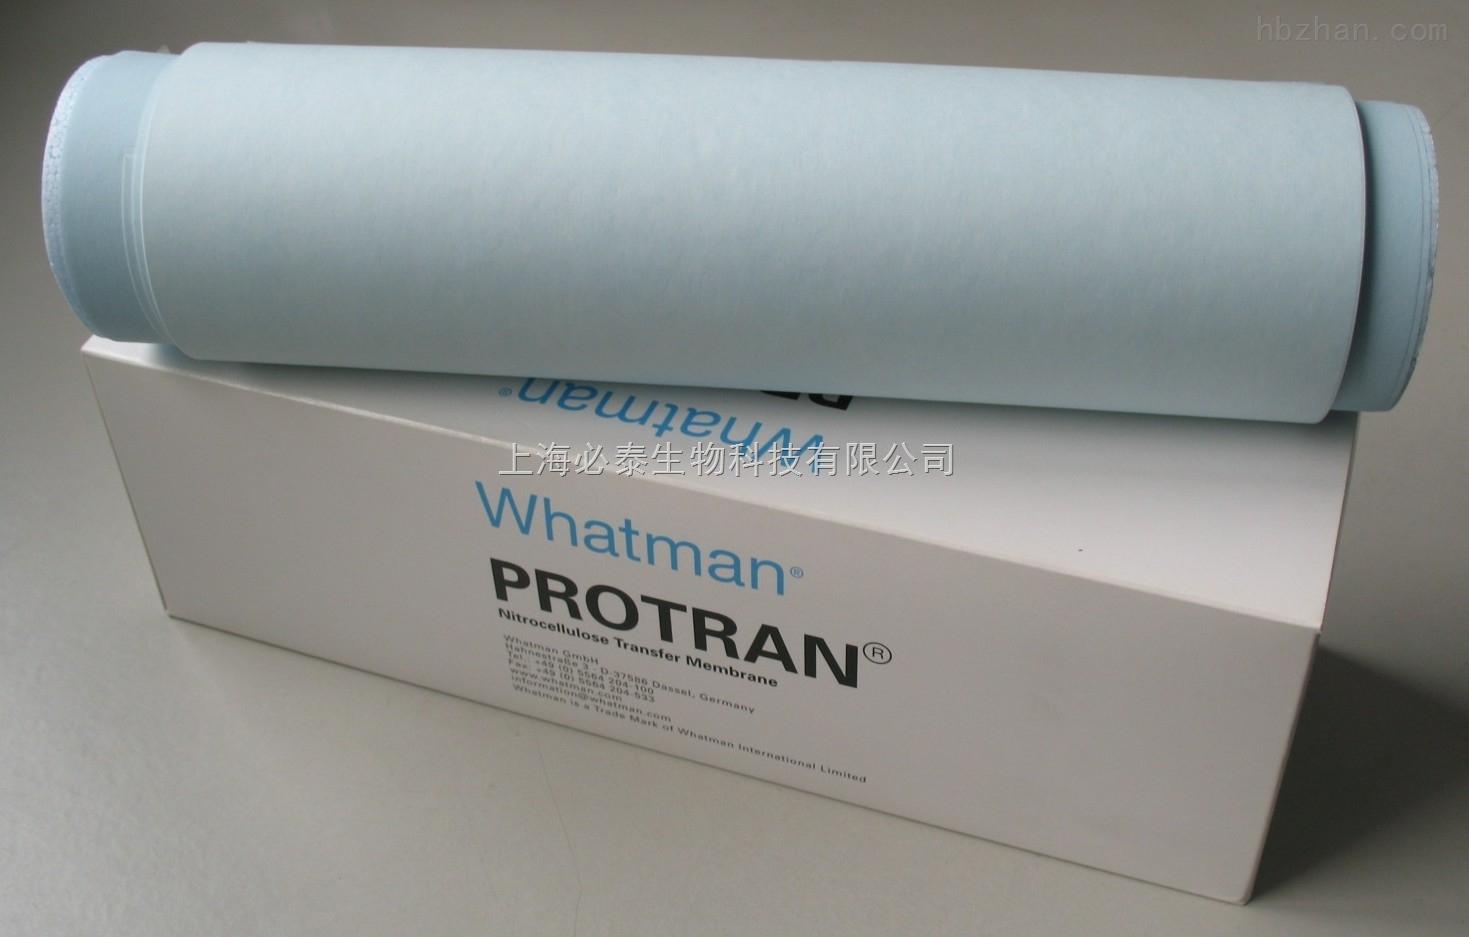 Whatman 沃特曼 Protran硝酸纤维素膜